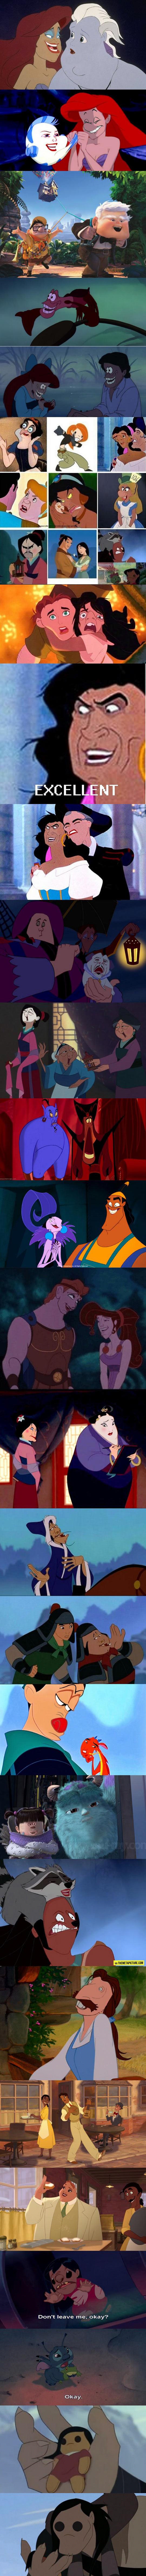 Hilarious Disney Characters Face-Swaps